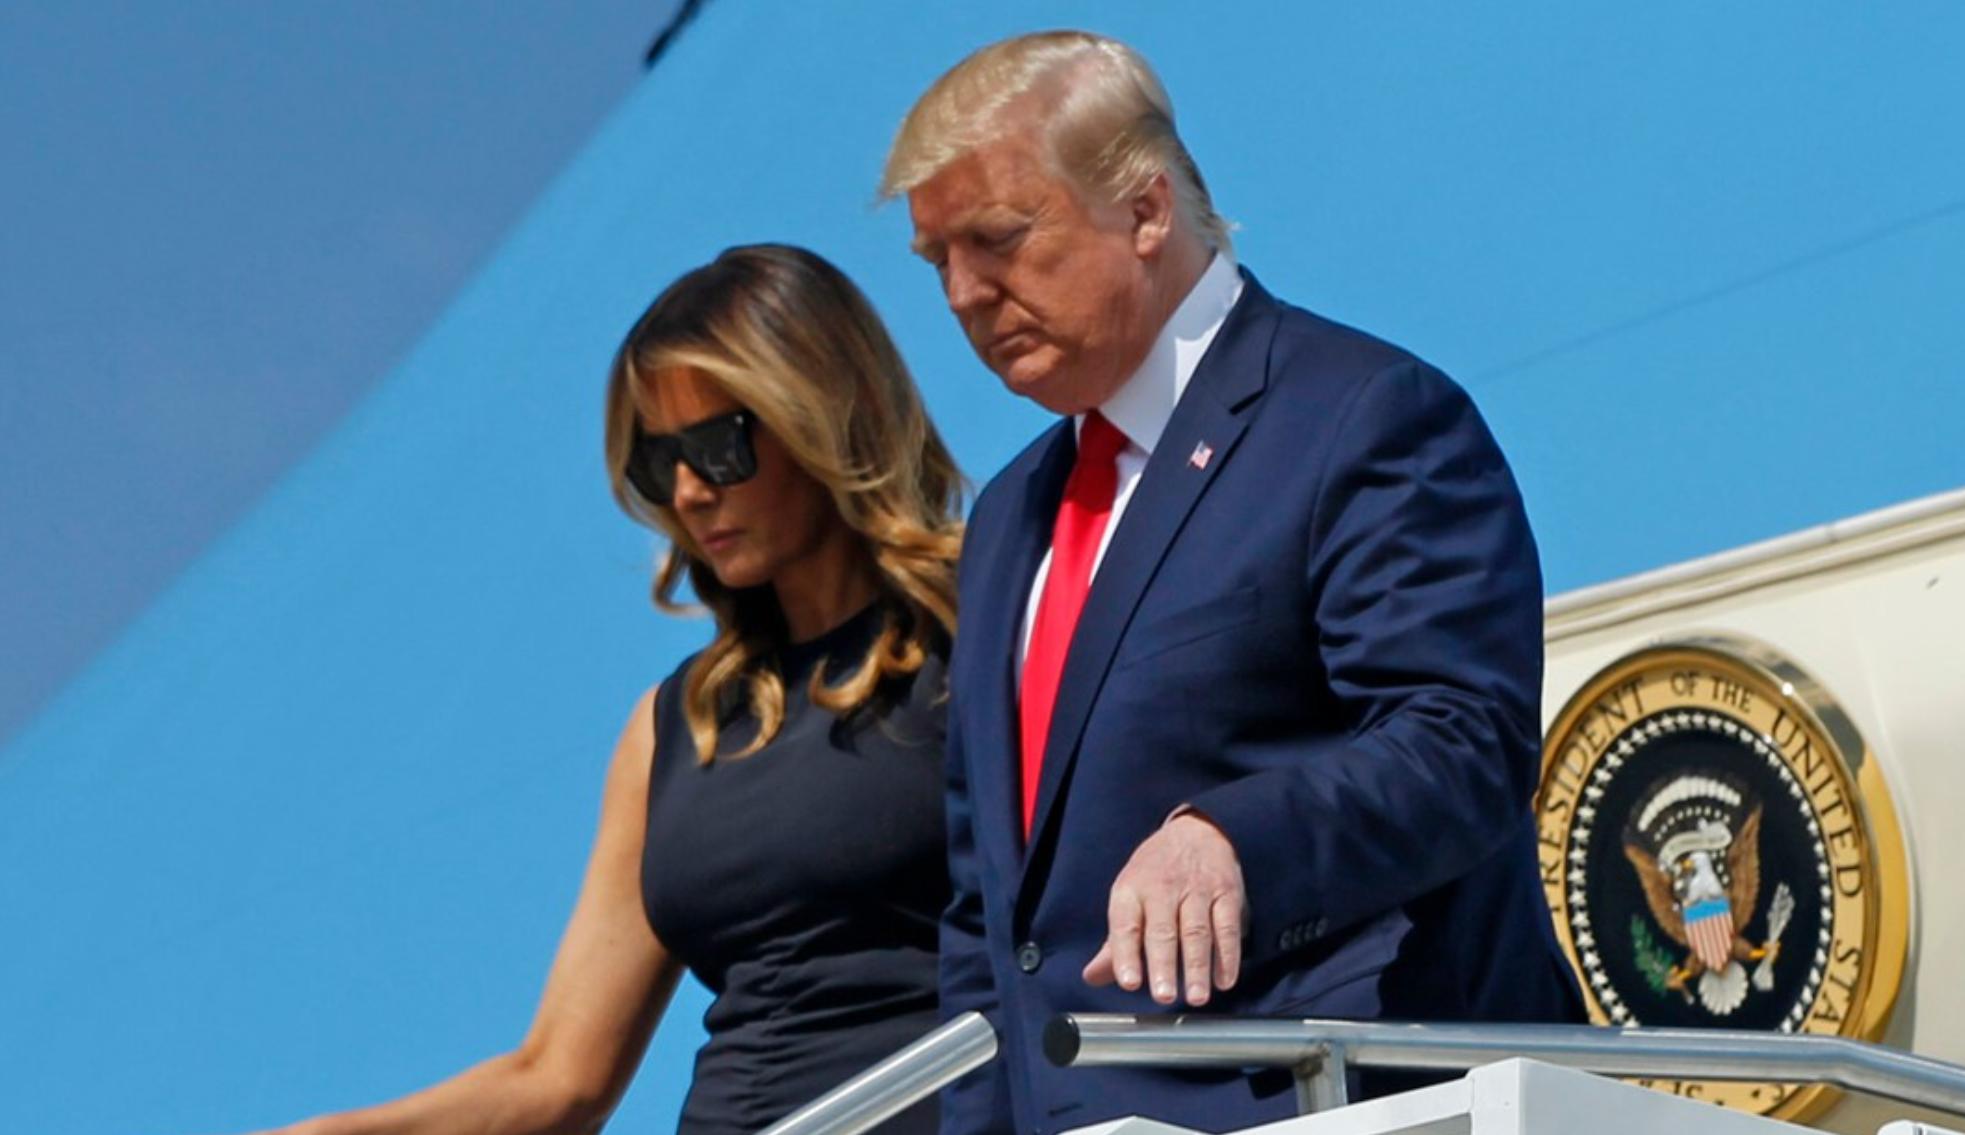 President Trump Visits Dayton Ohio, El Paso Texas After Mass Shootings